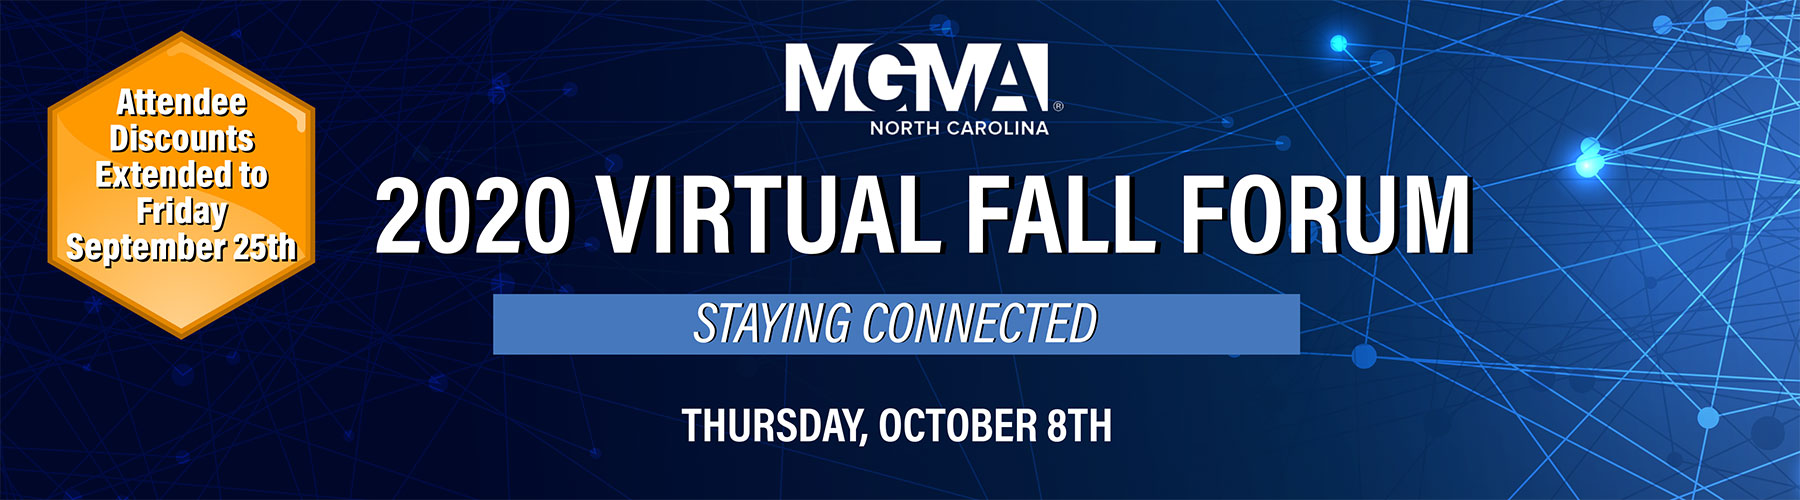 2020 Vitual Fall Forum